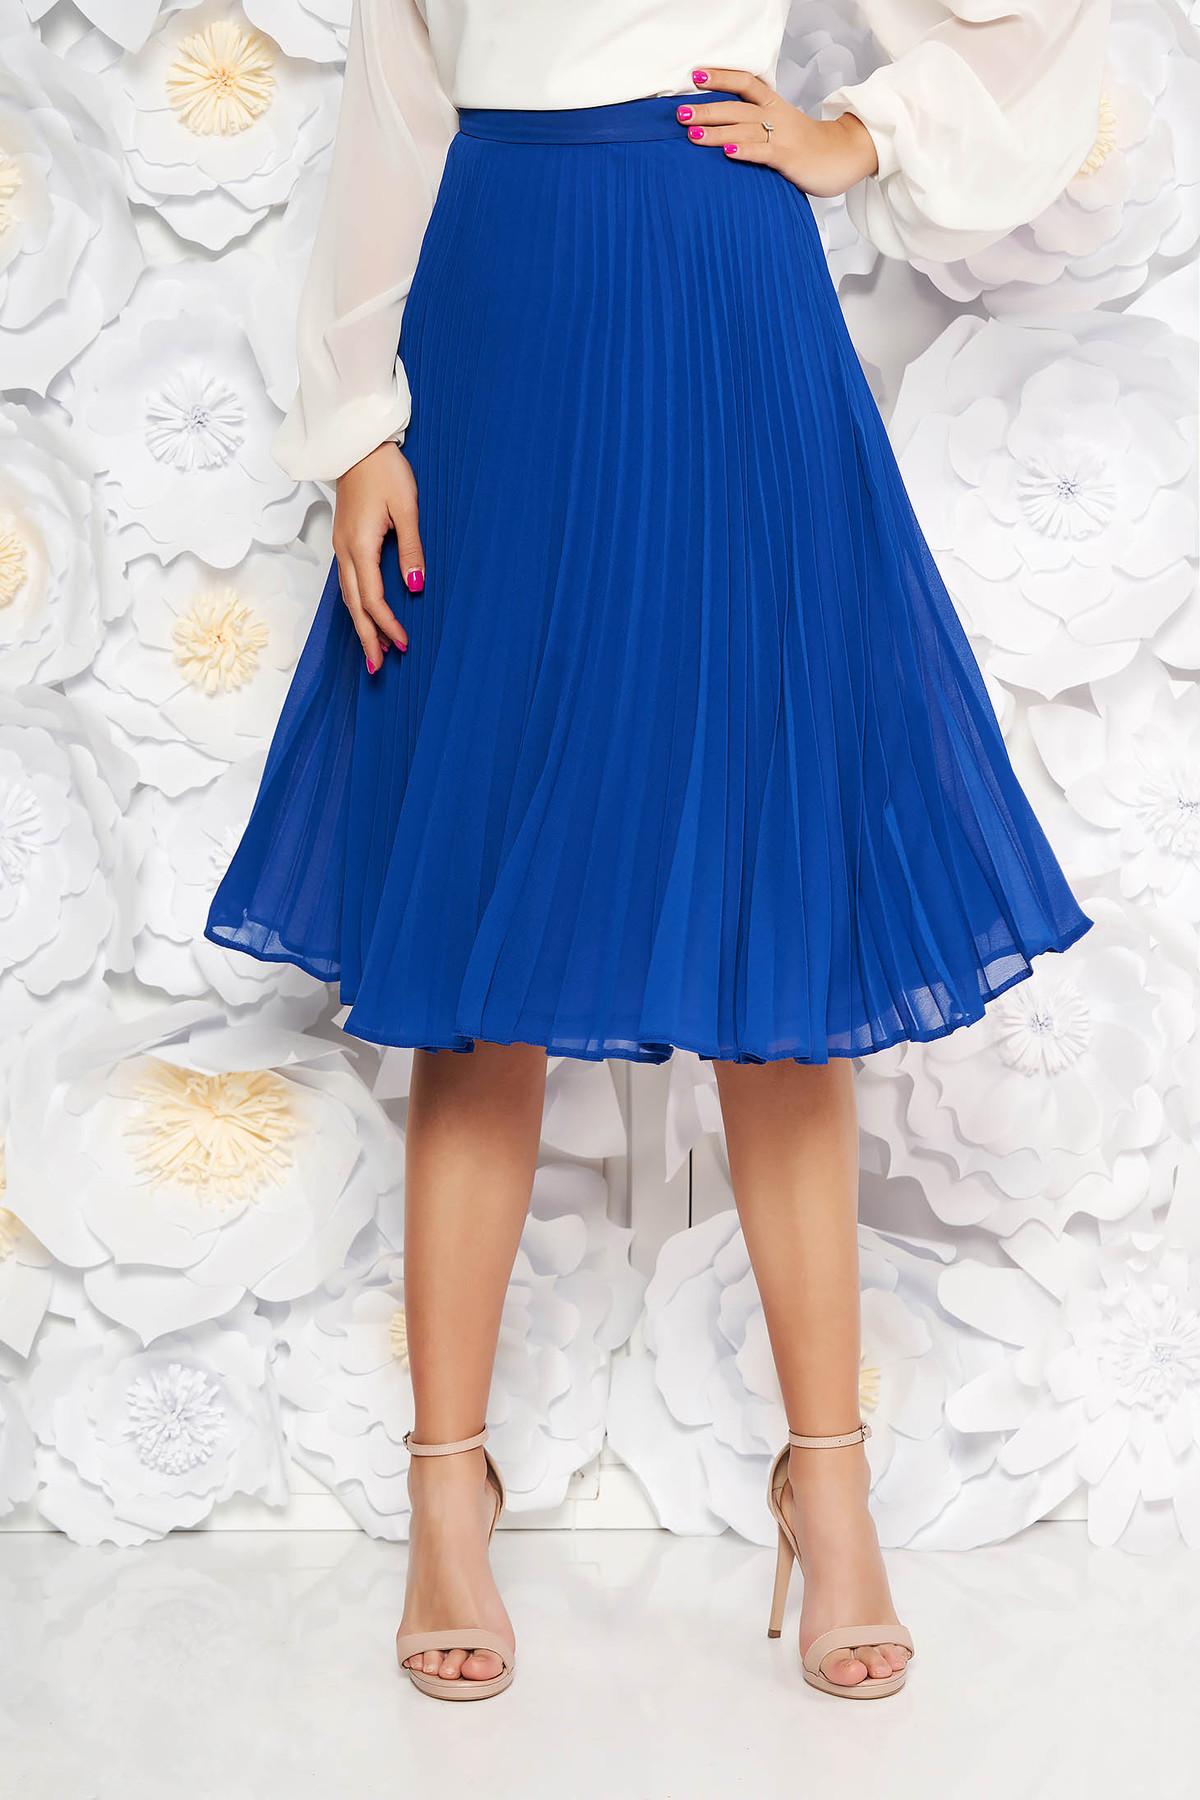 Fusta albastra StarShinerS eleganta in clos plisata cu talie medie din voal